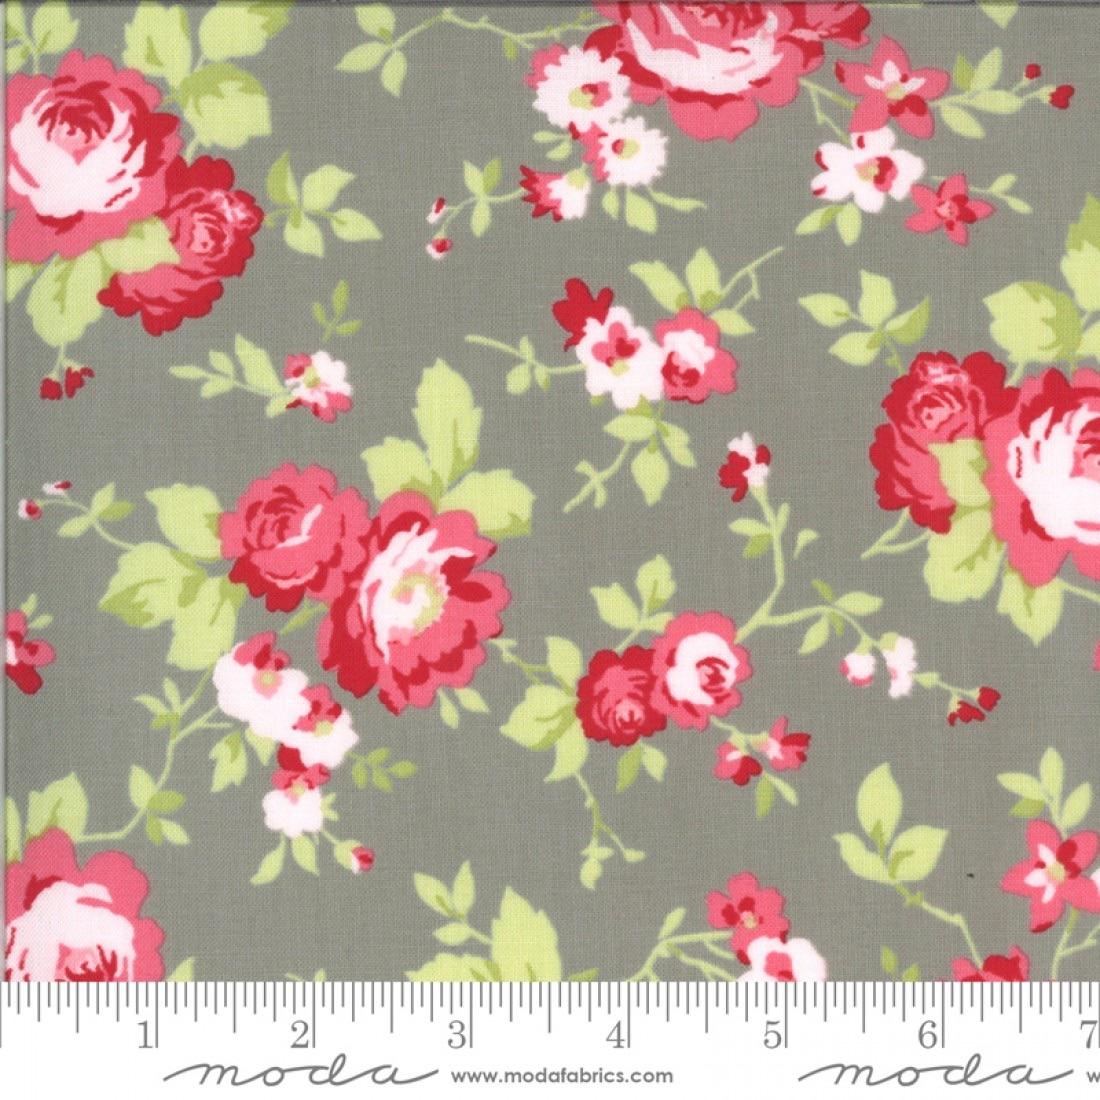 Moda Fabrics - Sophie by Brenda Riddle - Main Floral Cobblestone 100% Cotto